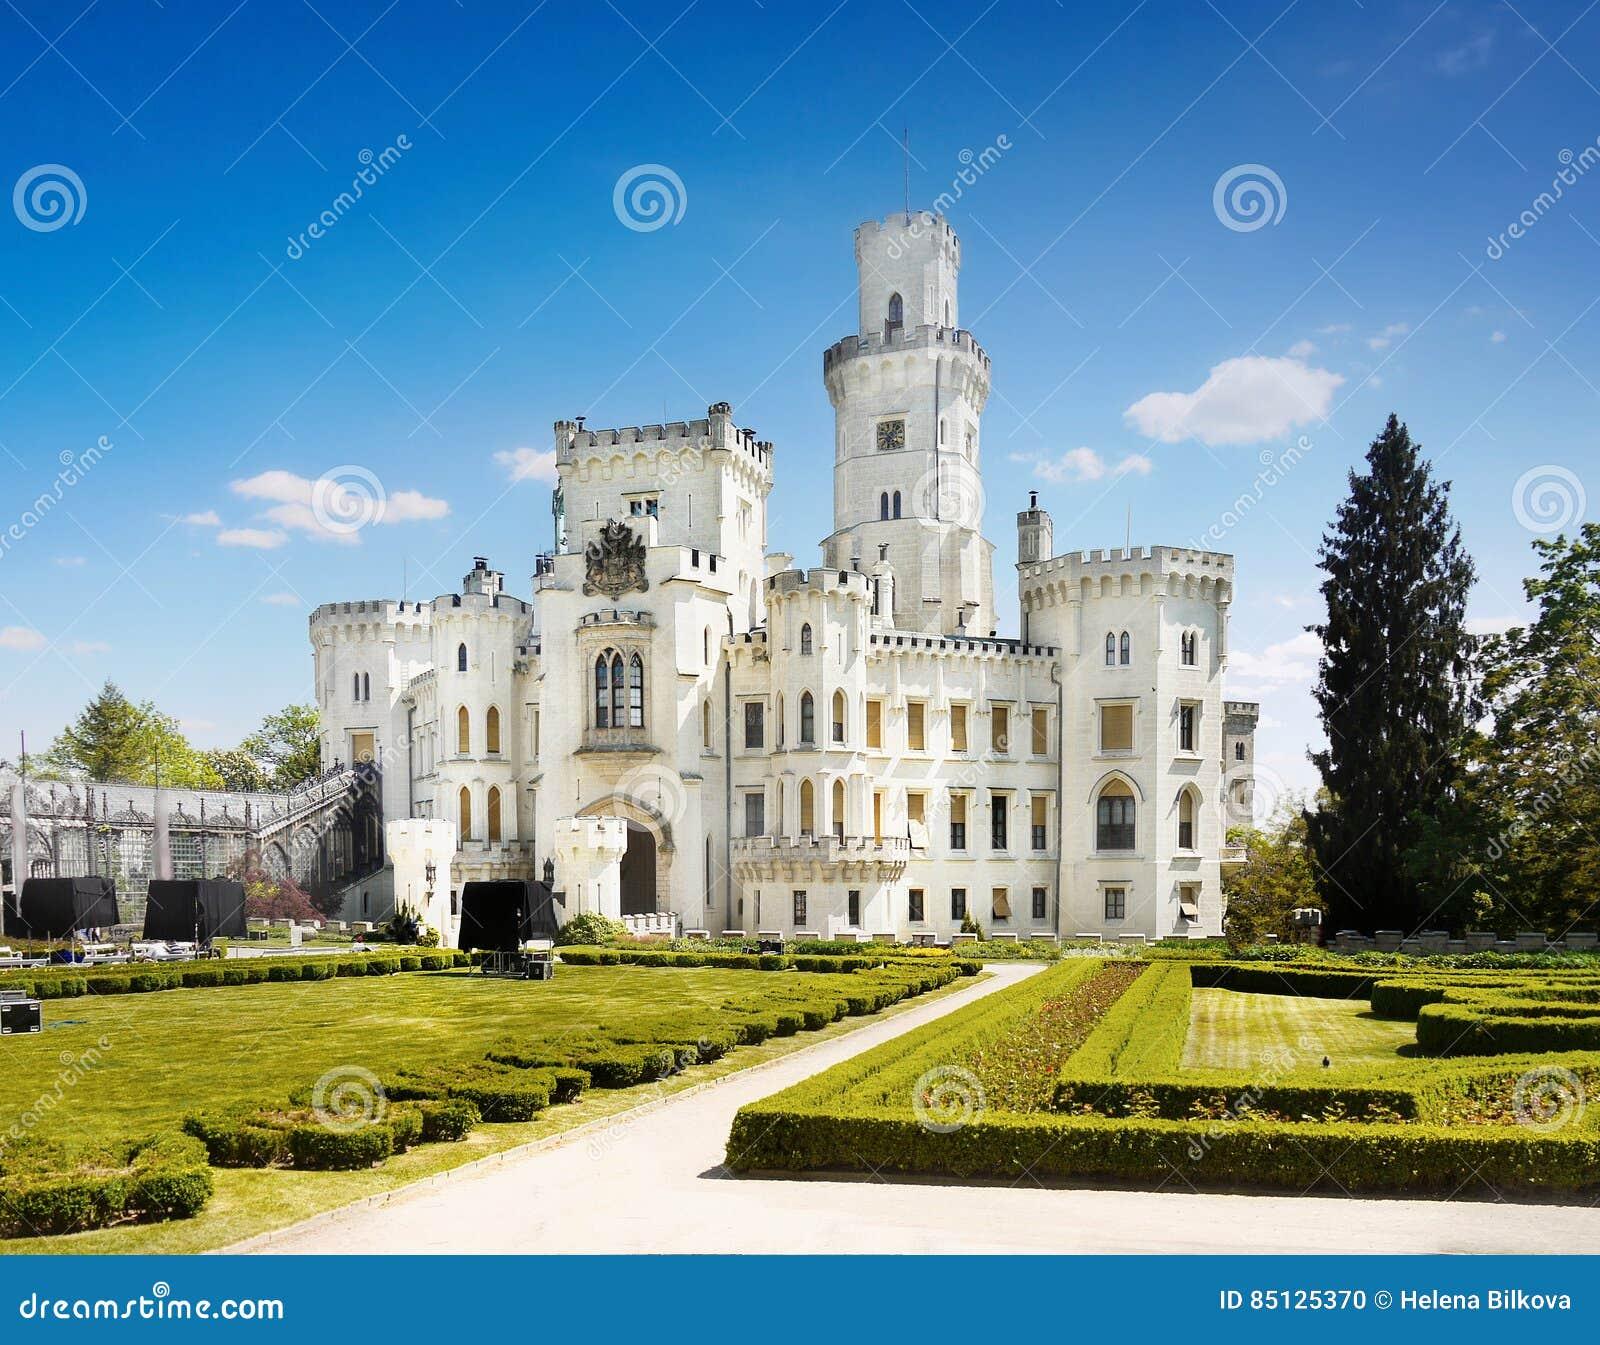 Fairytale Castle stock photo  Image of czech, garden - 85125370